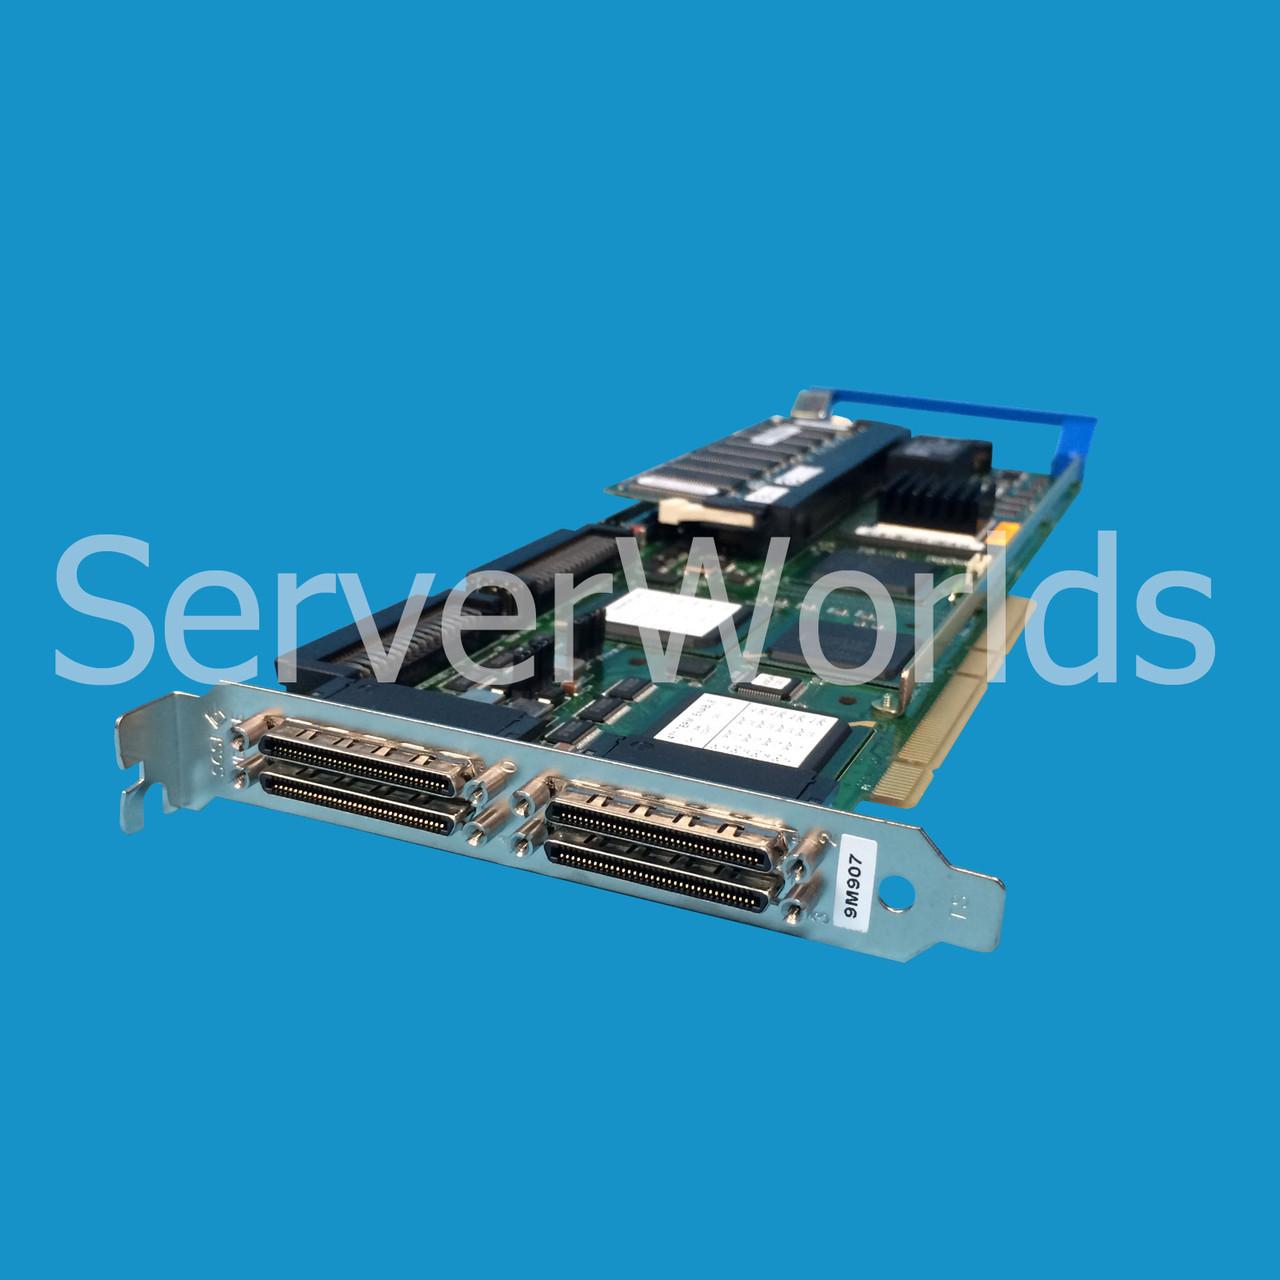 Dell 9M907 | Perc 3 QC Raid Controller w/128MB and BBU - Serverworlds